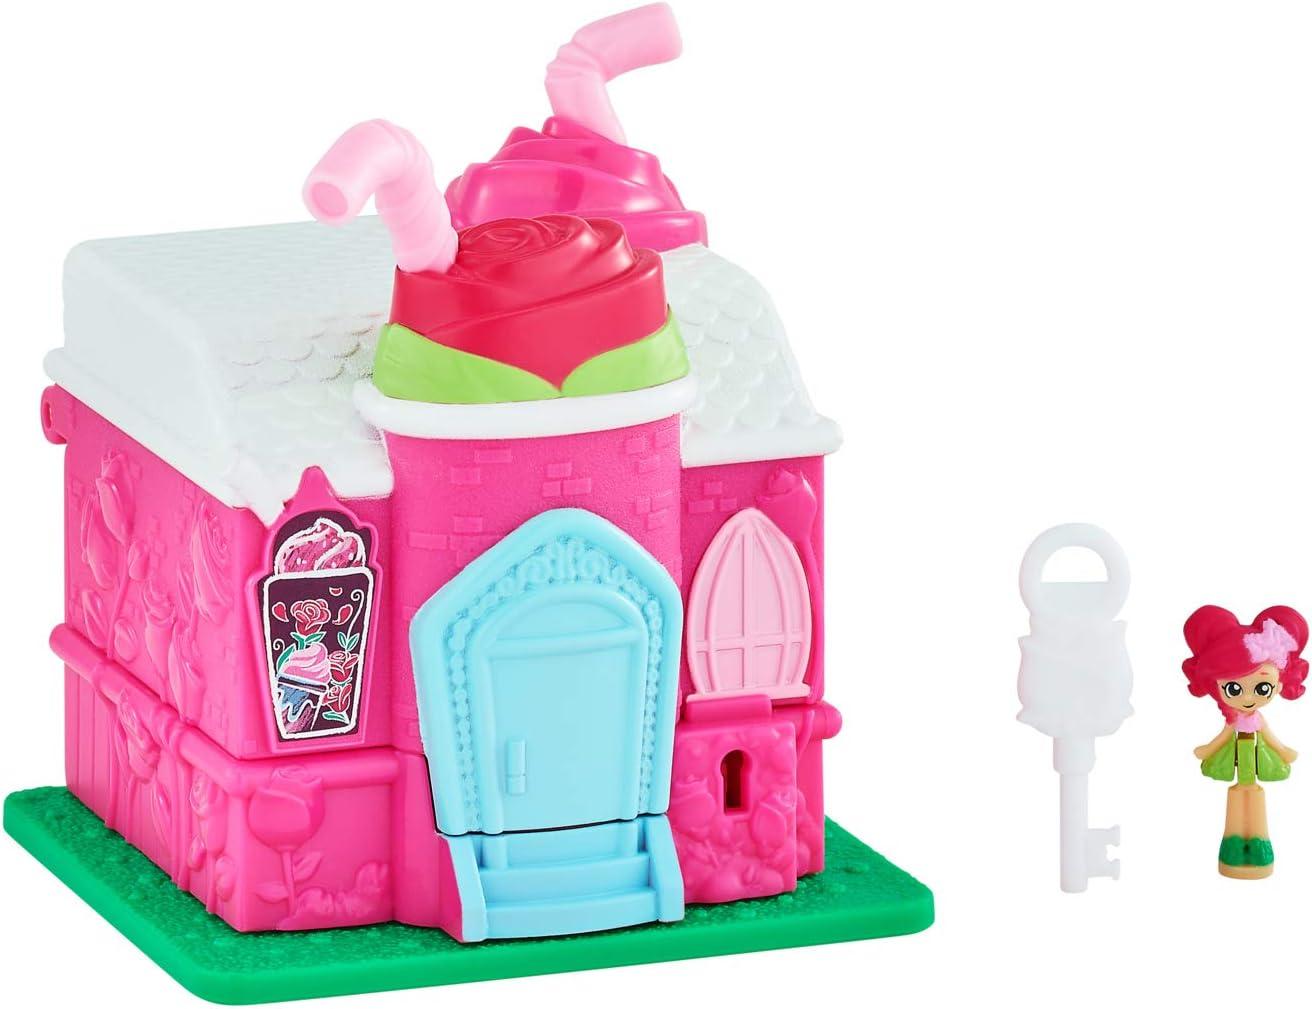 Shopkins Lil Secrets Mini Playset - Rosie Bloom Café